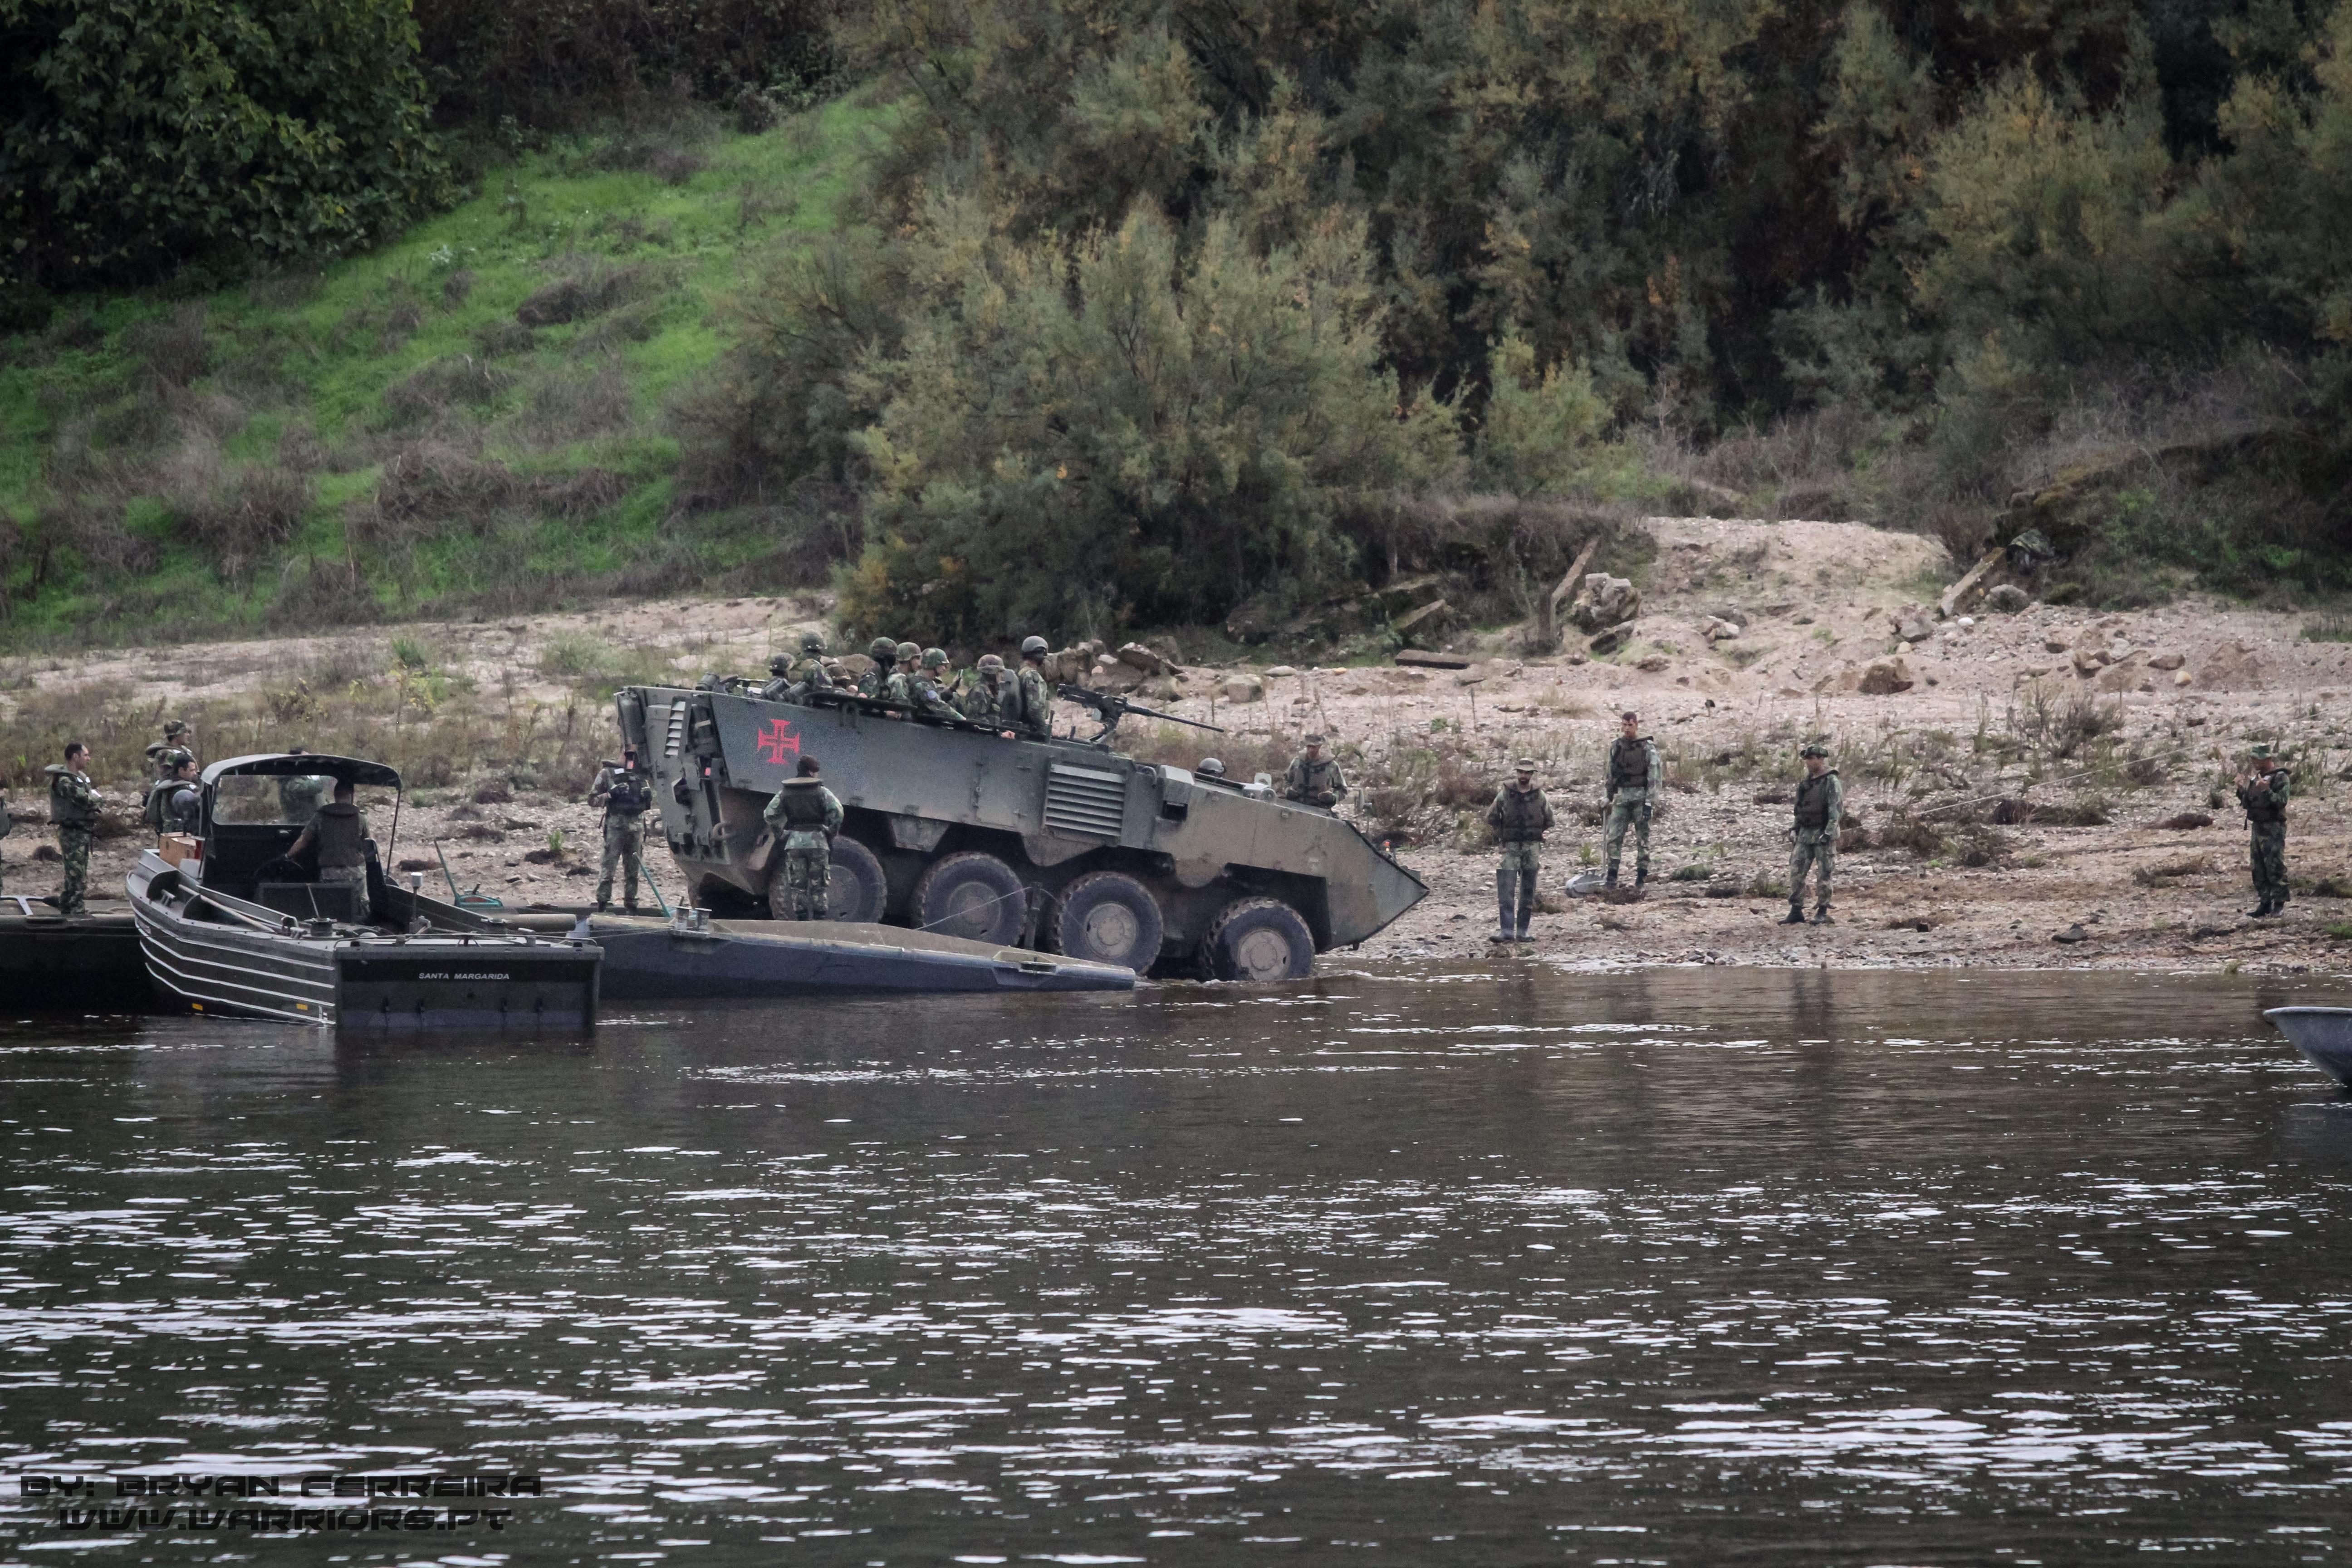 PANDUR APC inicia deslocamento após travessia do Rio Tejo